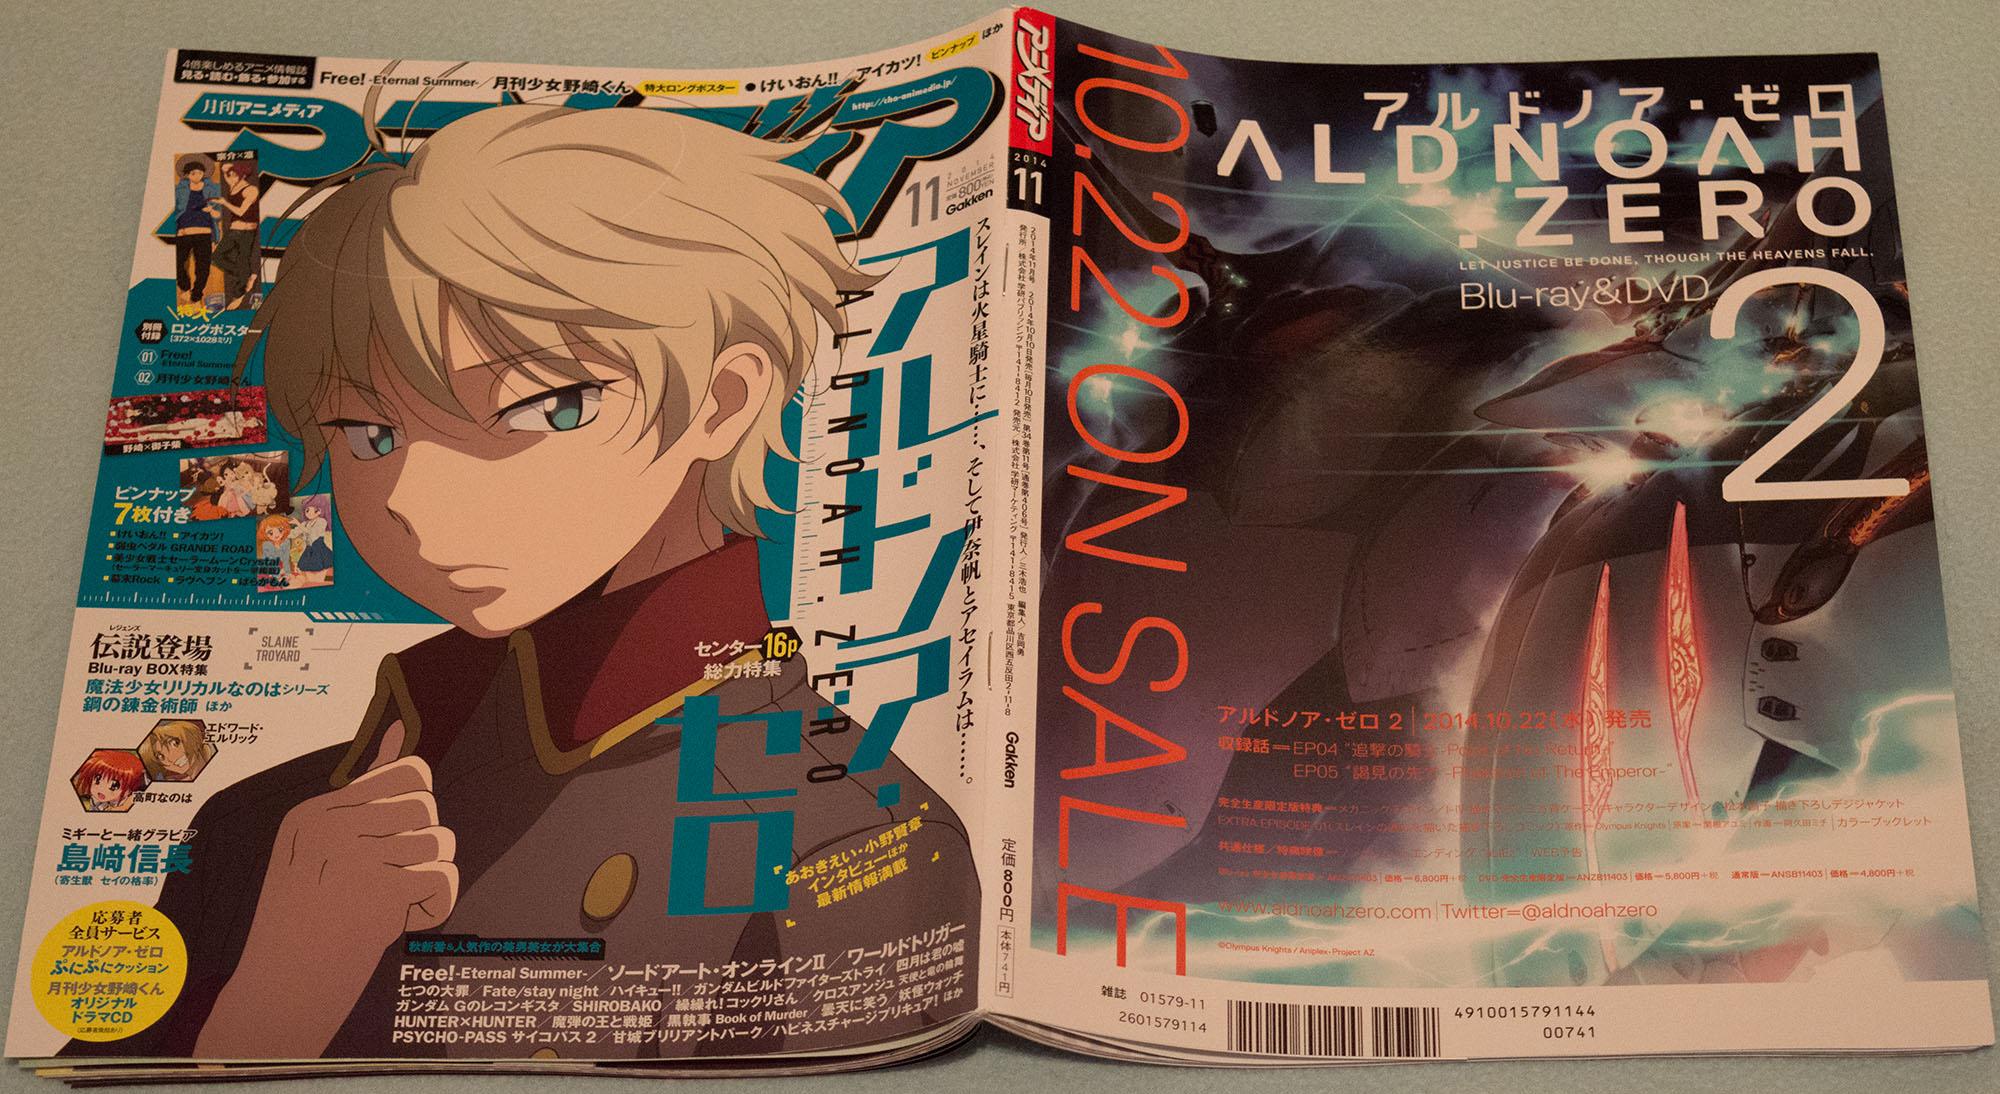 Haruhichan.com-animedia-November-2014 aldnoah zero 2 cover and back